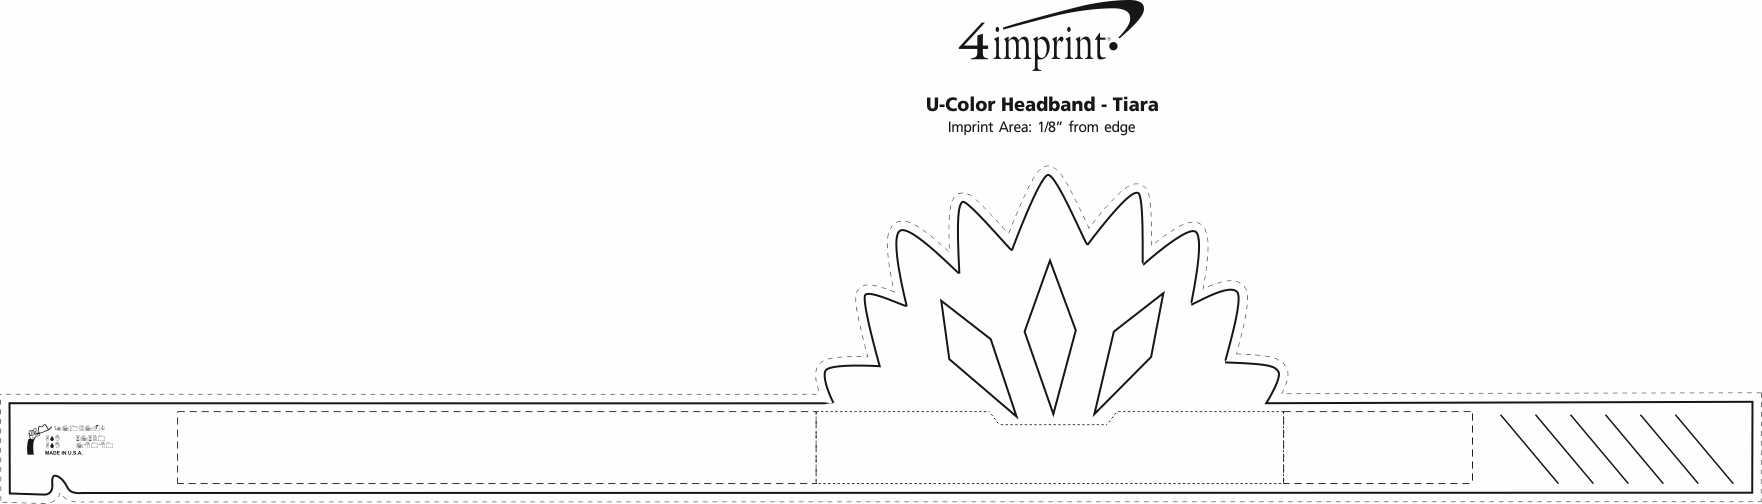 Imprint Area of U-Color Headband - Tiara